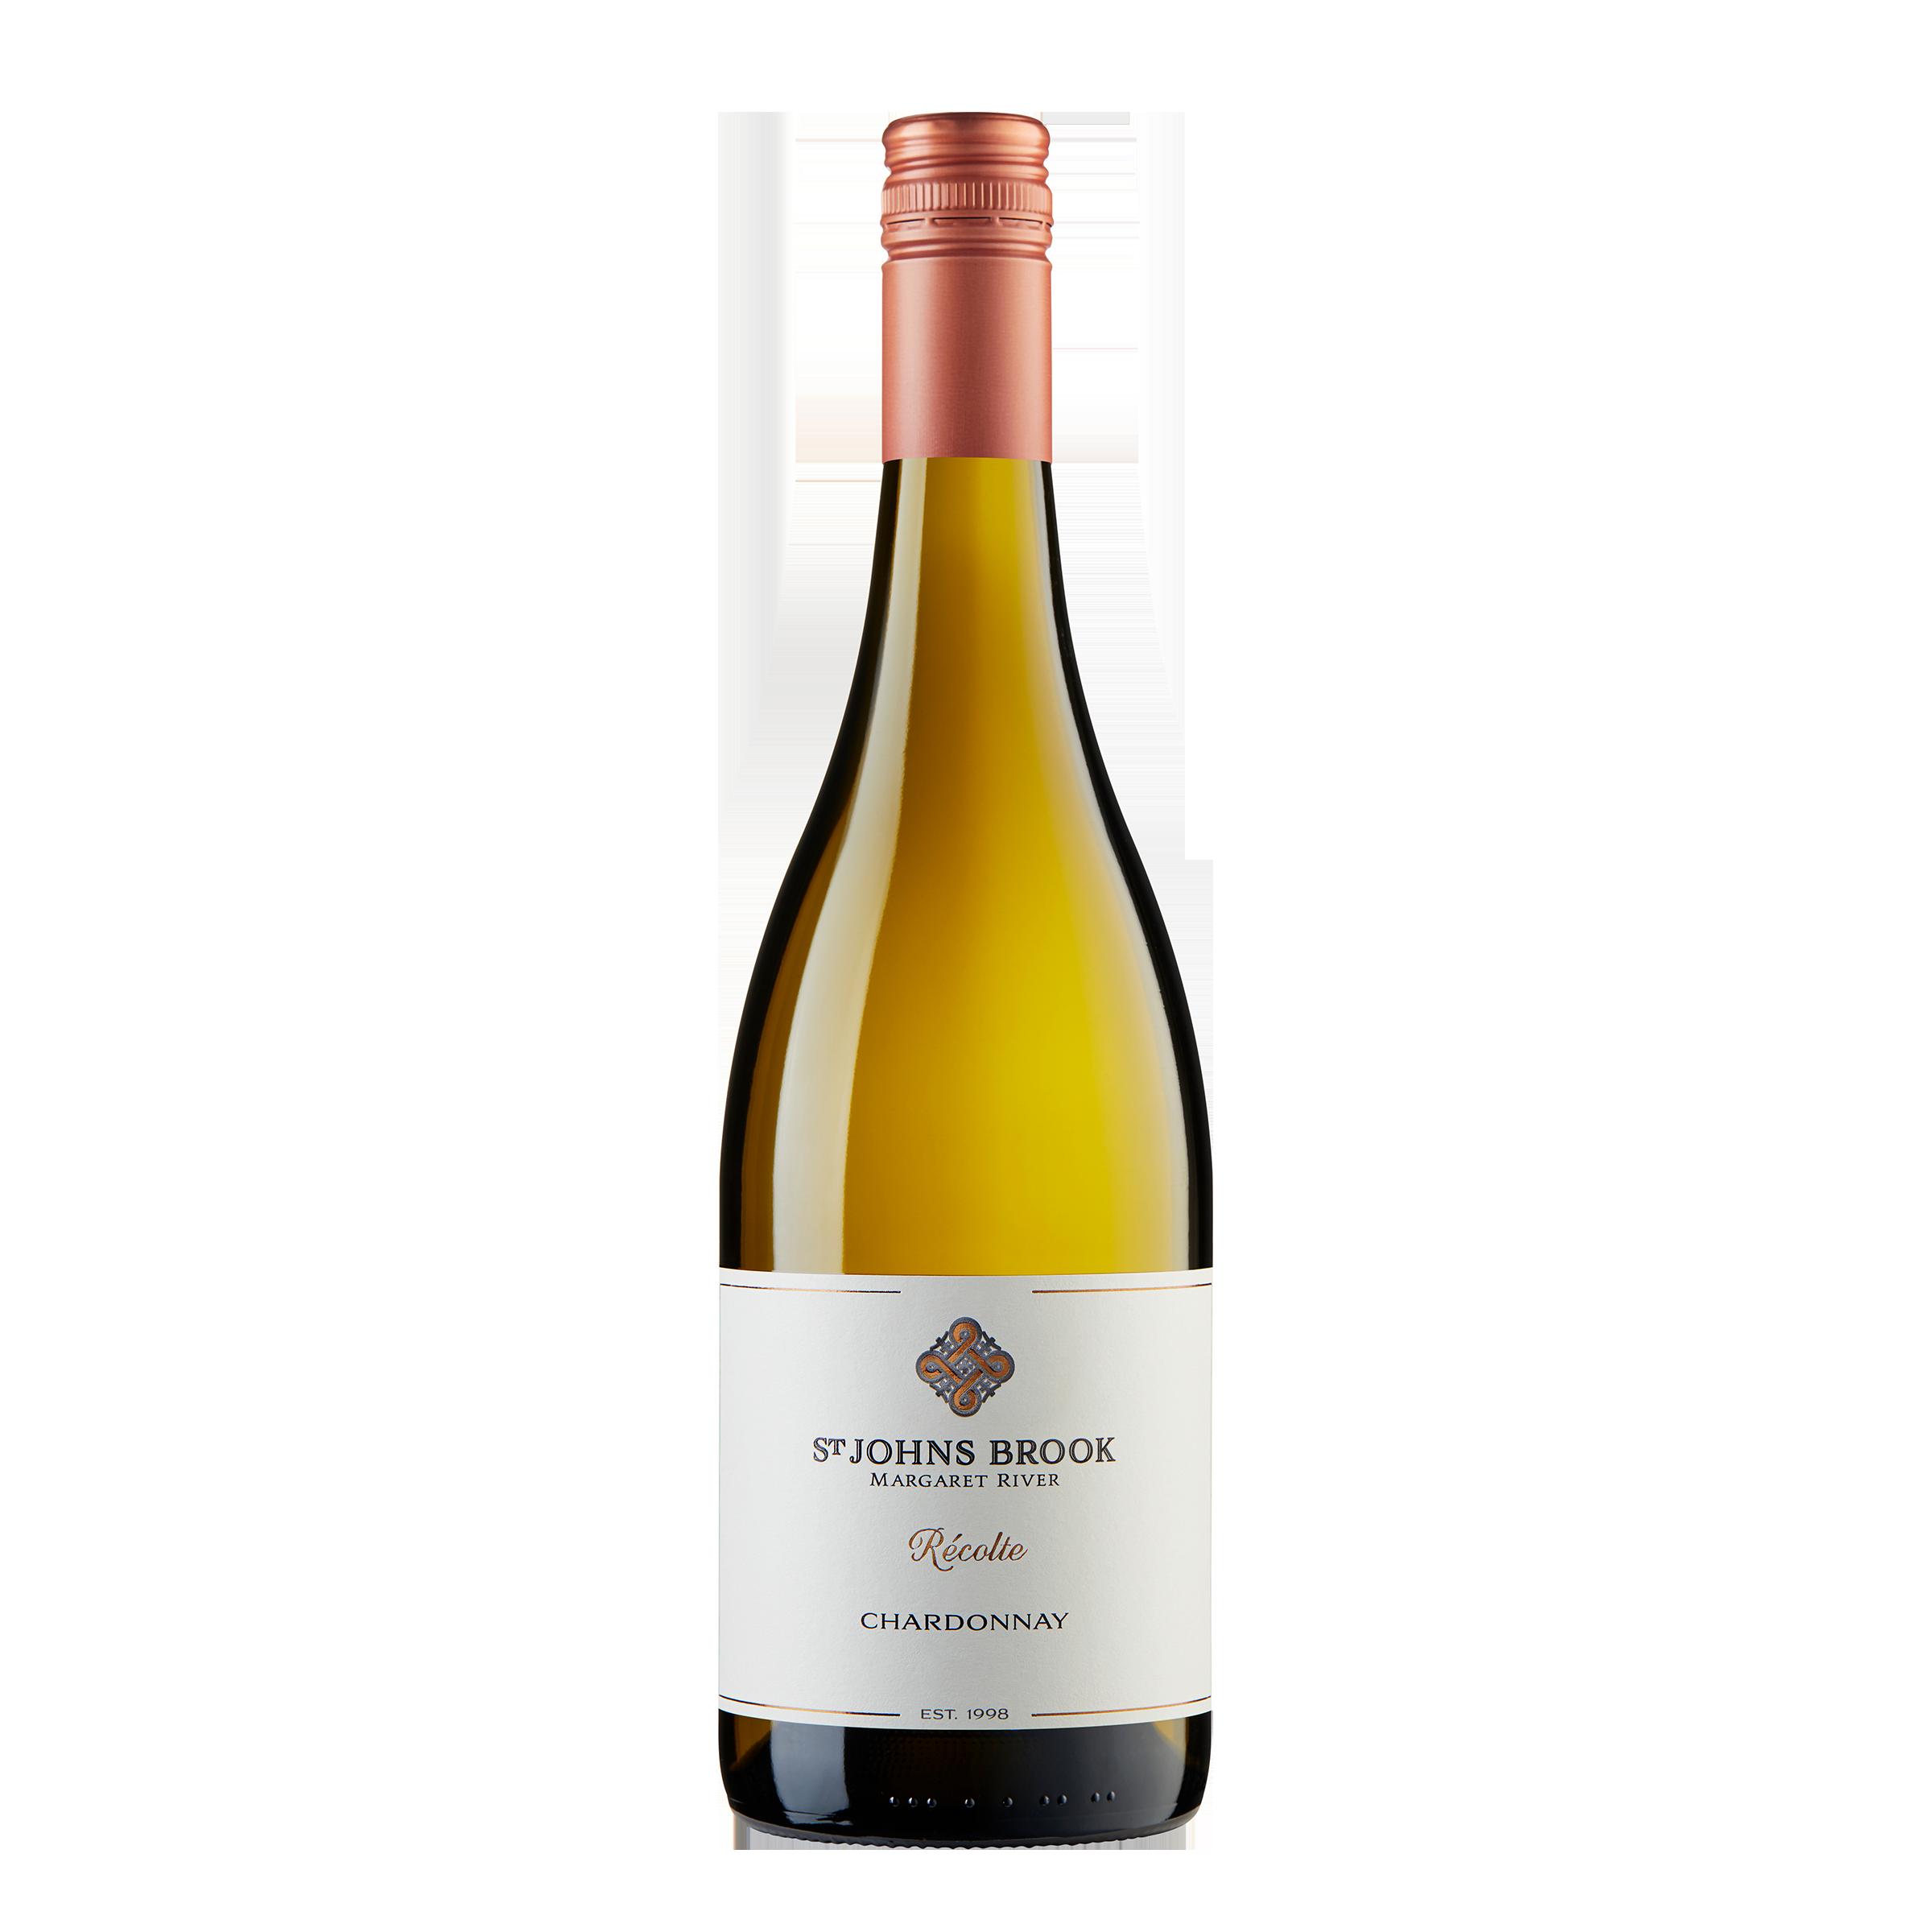 St Johns Brook Recolte Chardonnay 750ml 2018